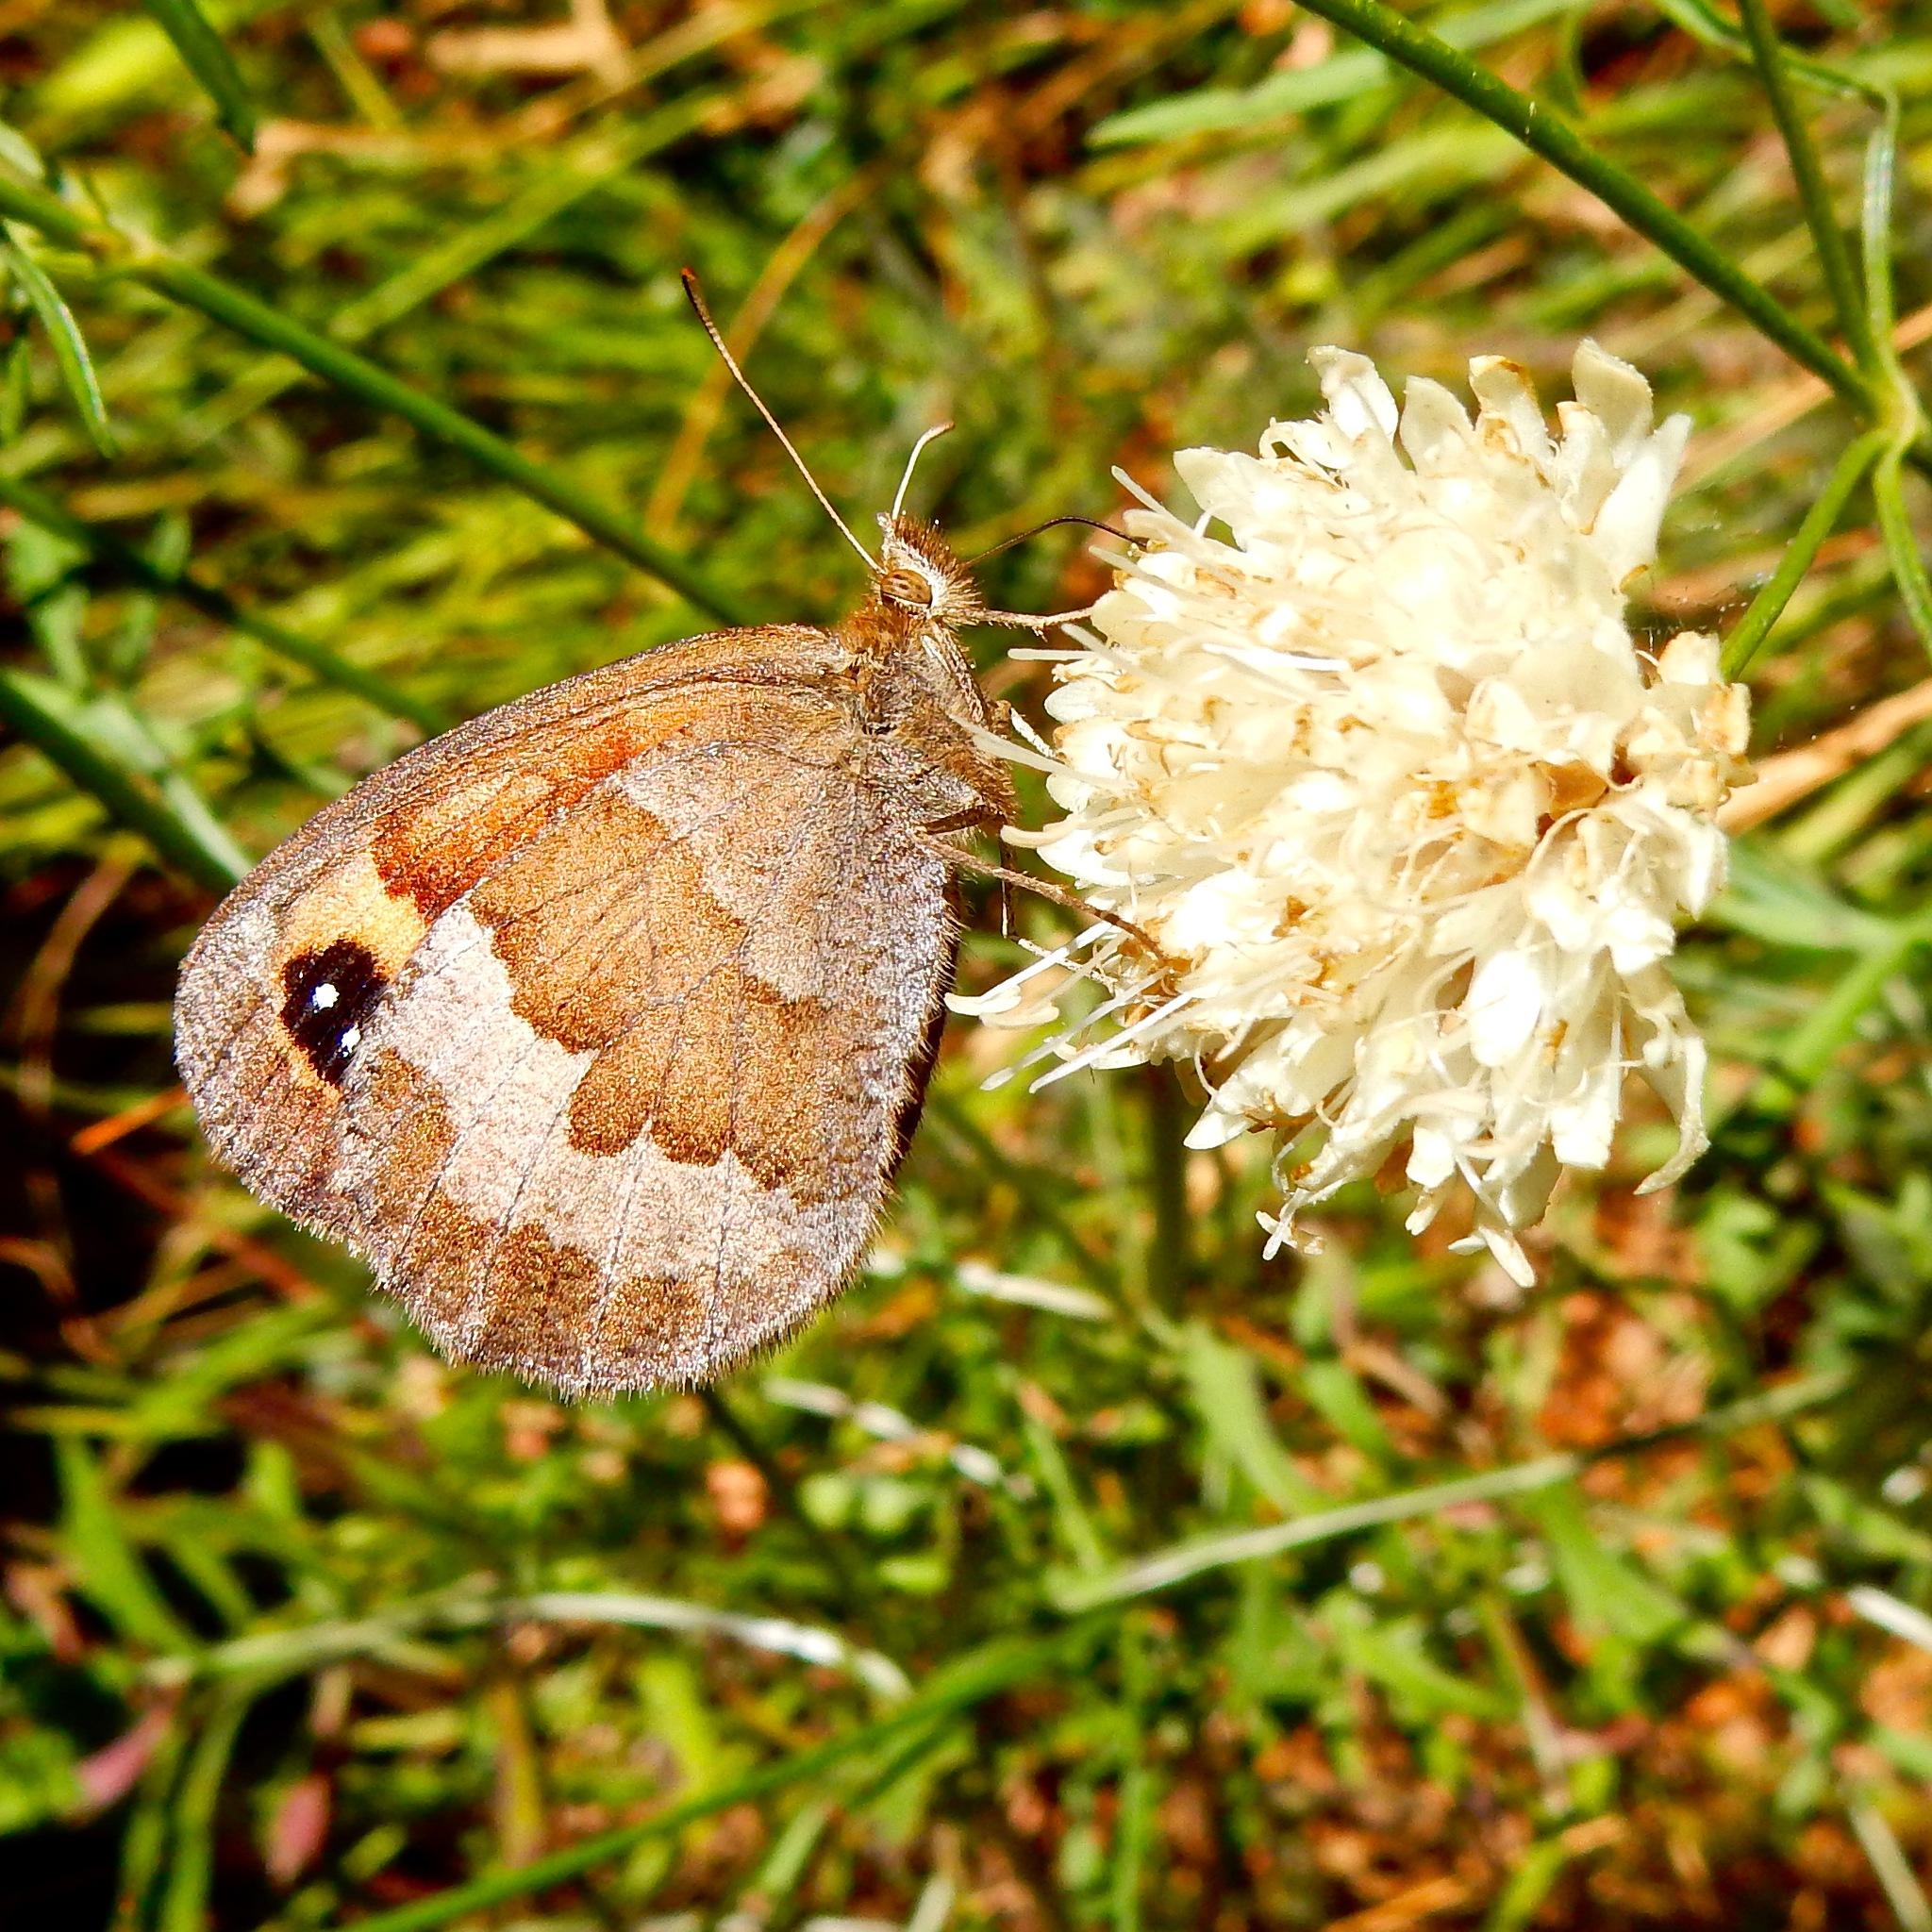 Vlinder / Butterfly by Jitske Knol